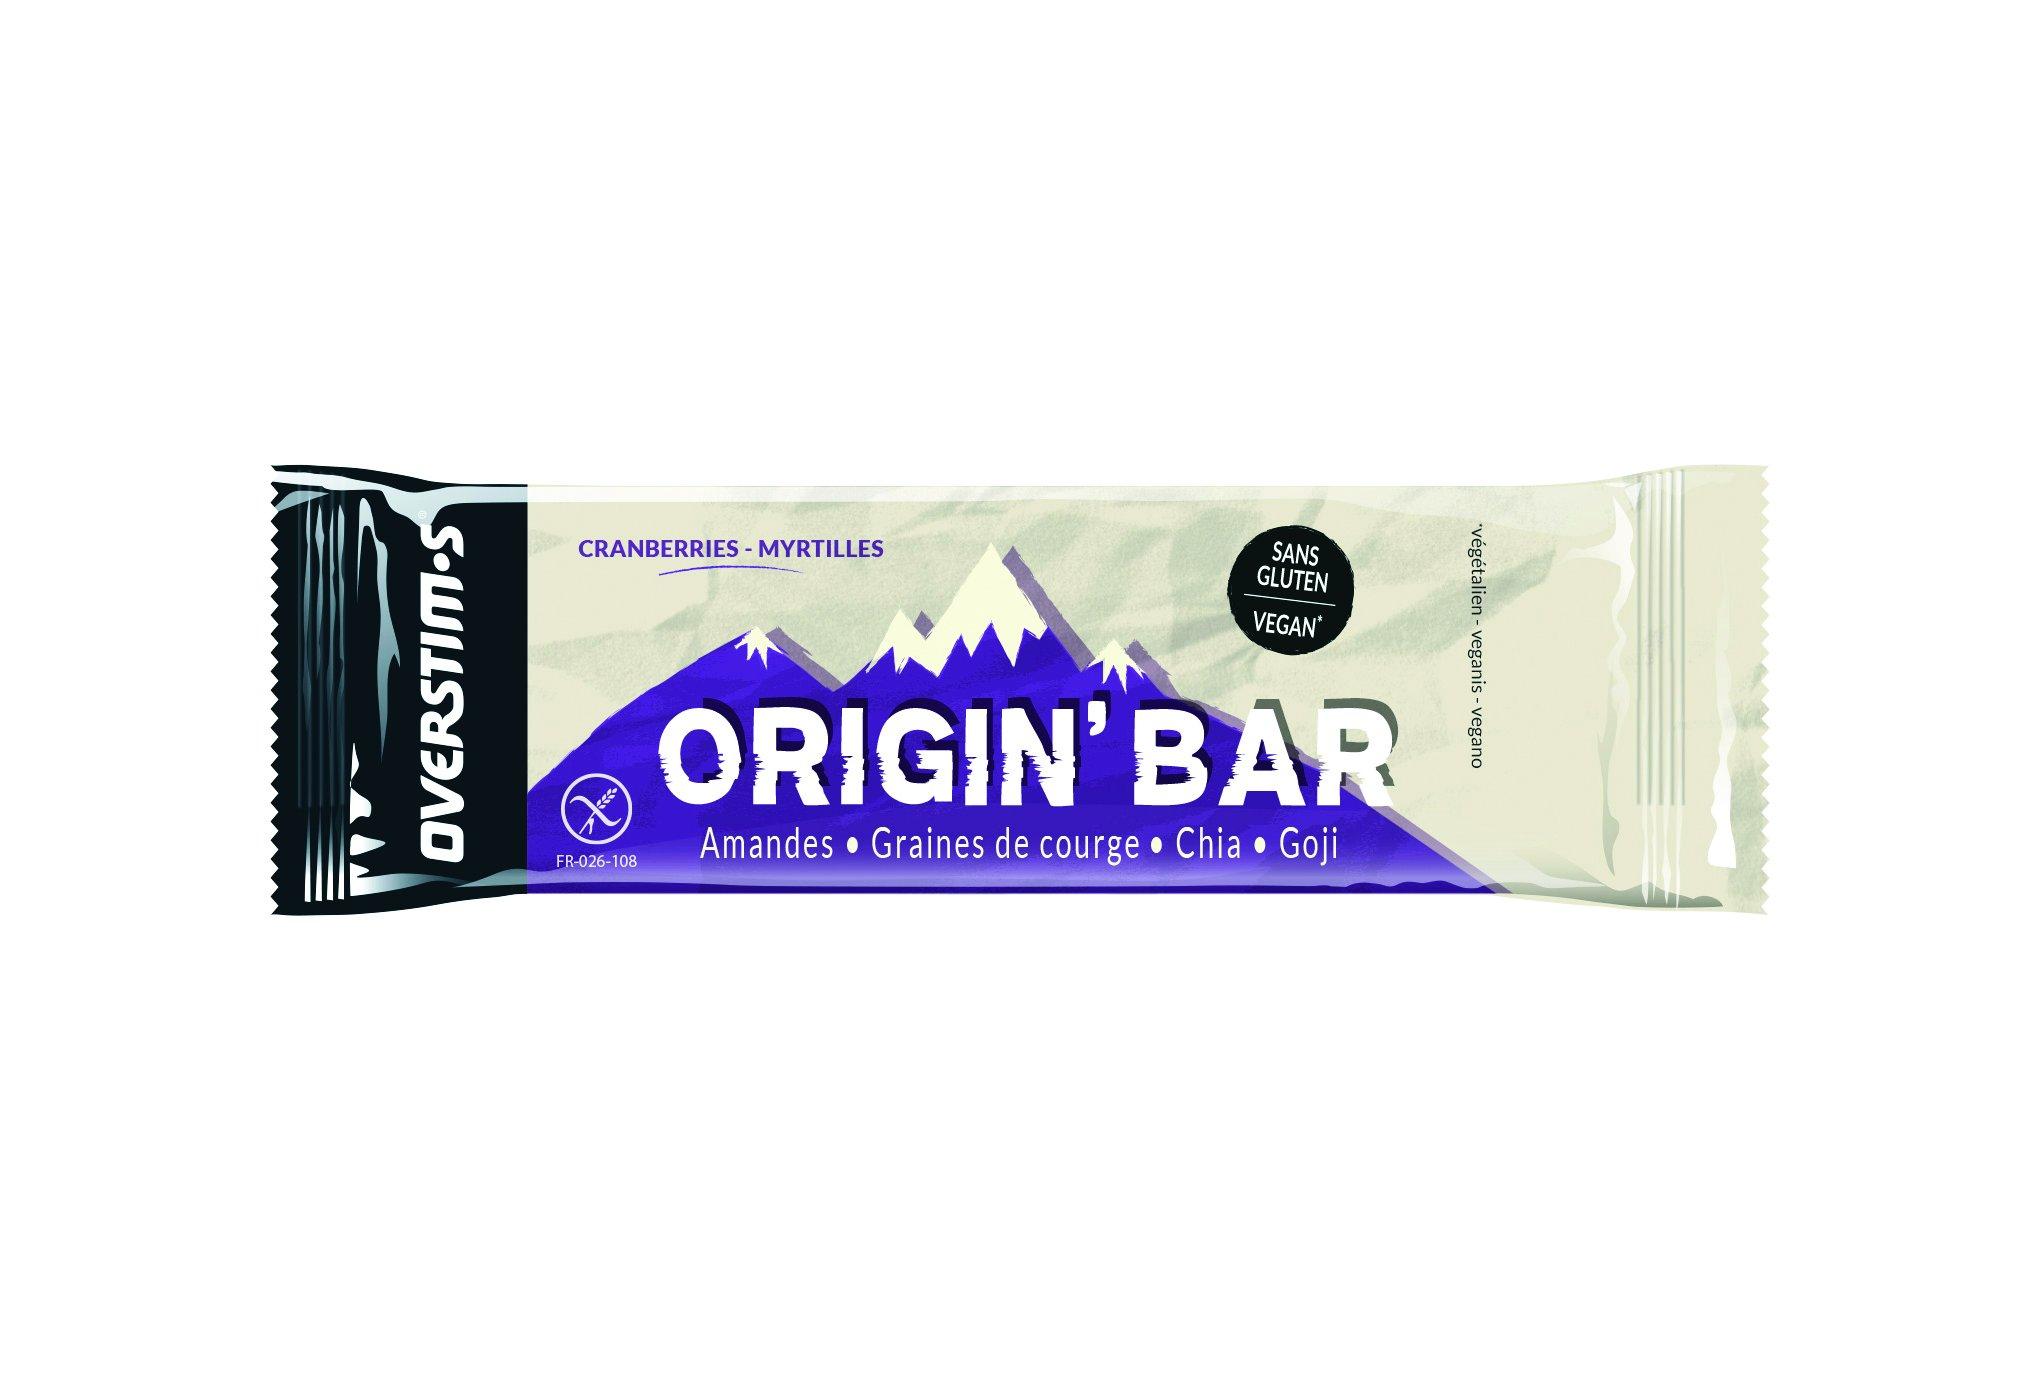 OVERSTIMS Origin Bar - Cranberries/myrtilles Diététique Barres